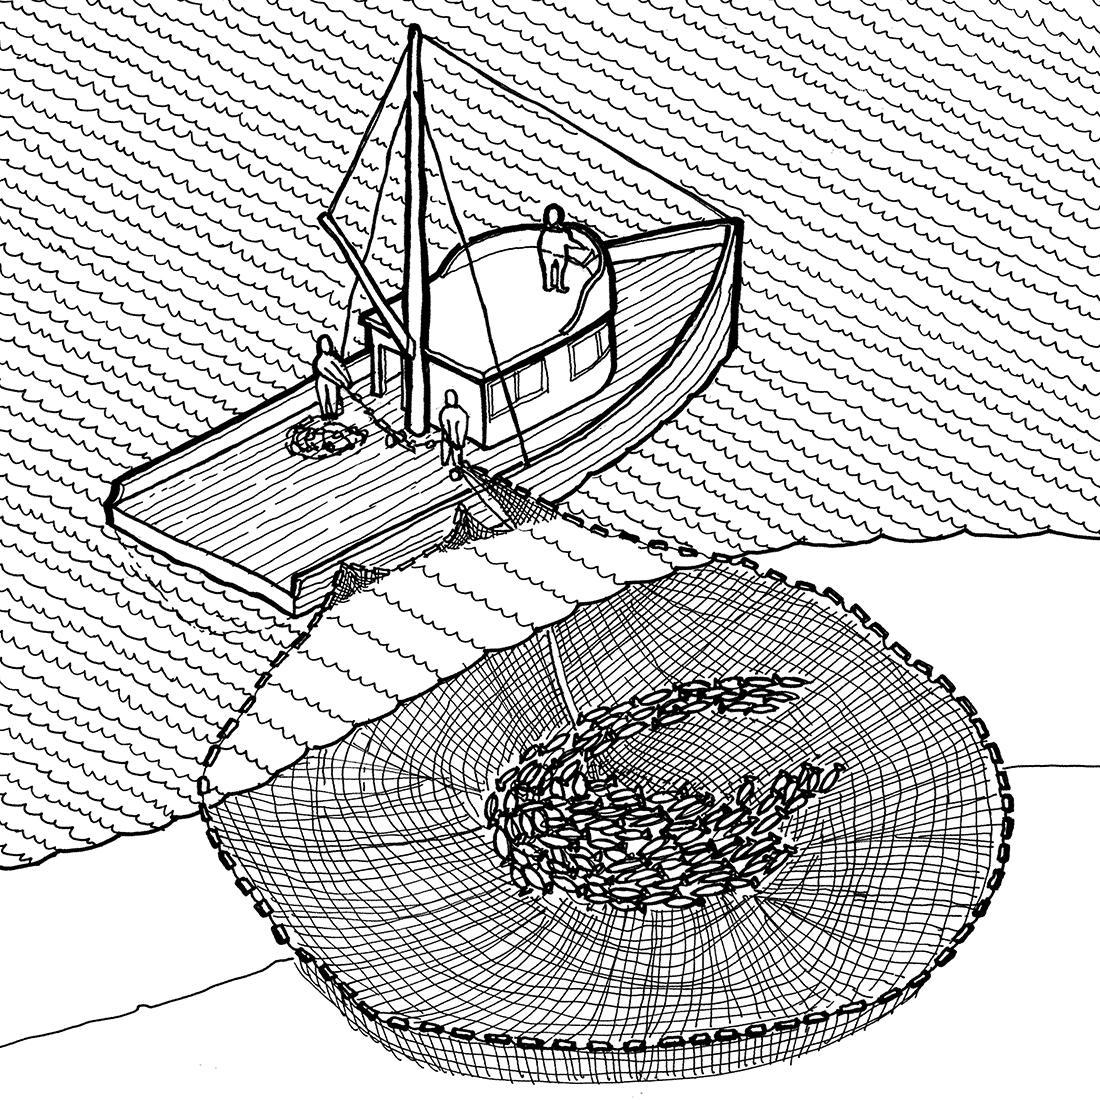 illustration d'un bateau de pêche hissant un filet